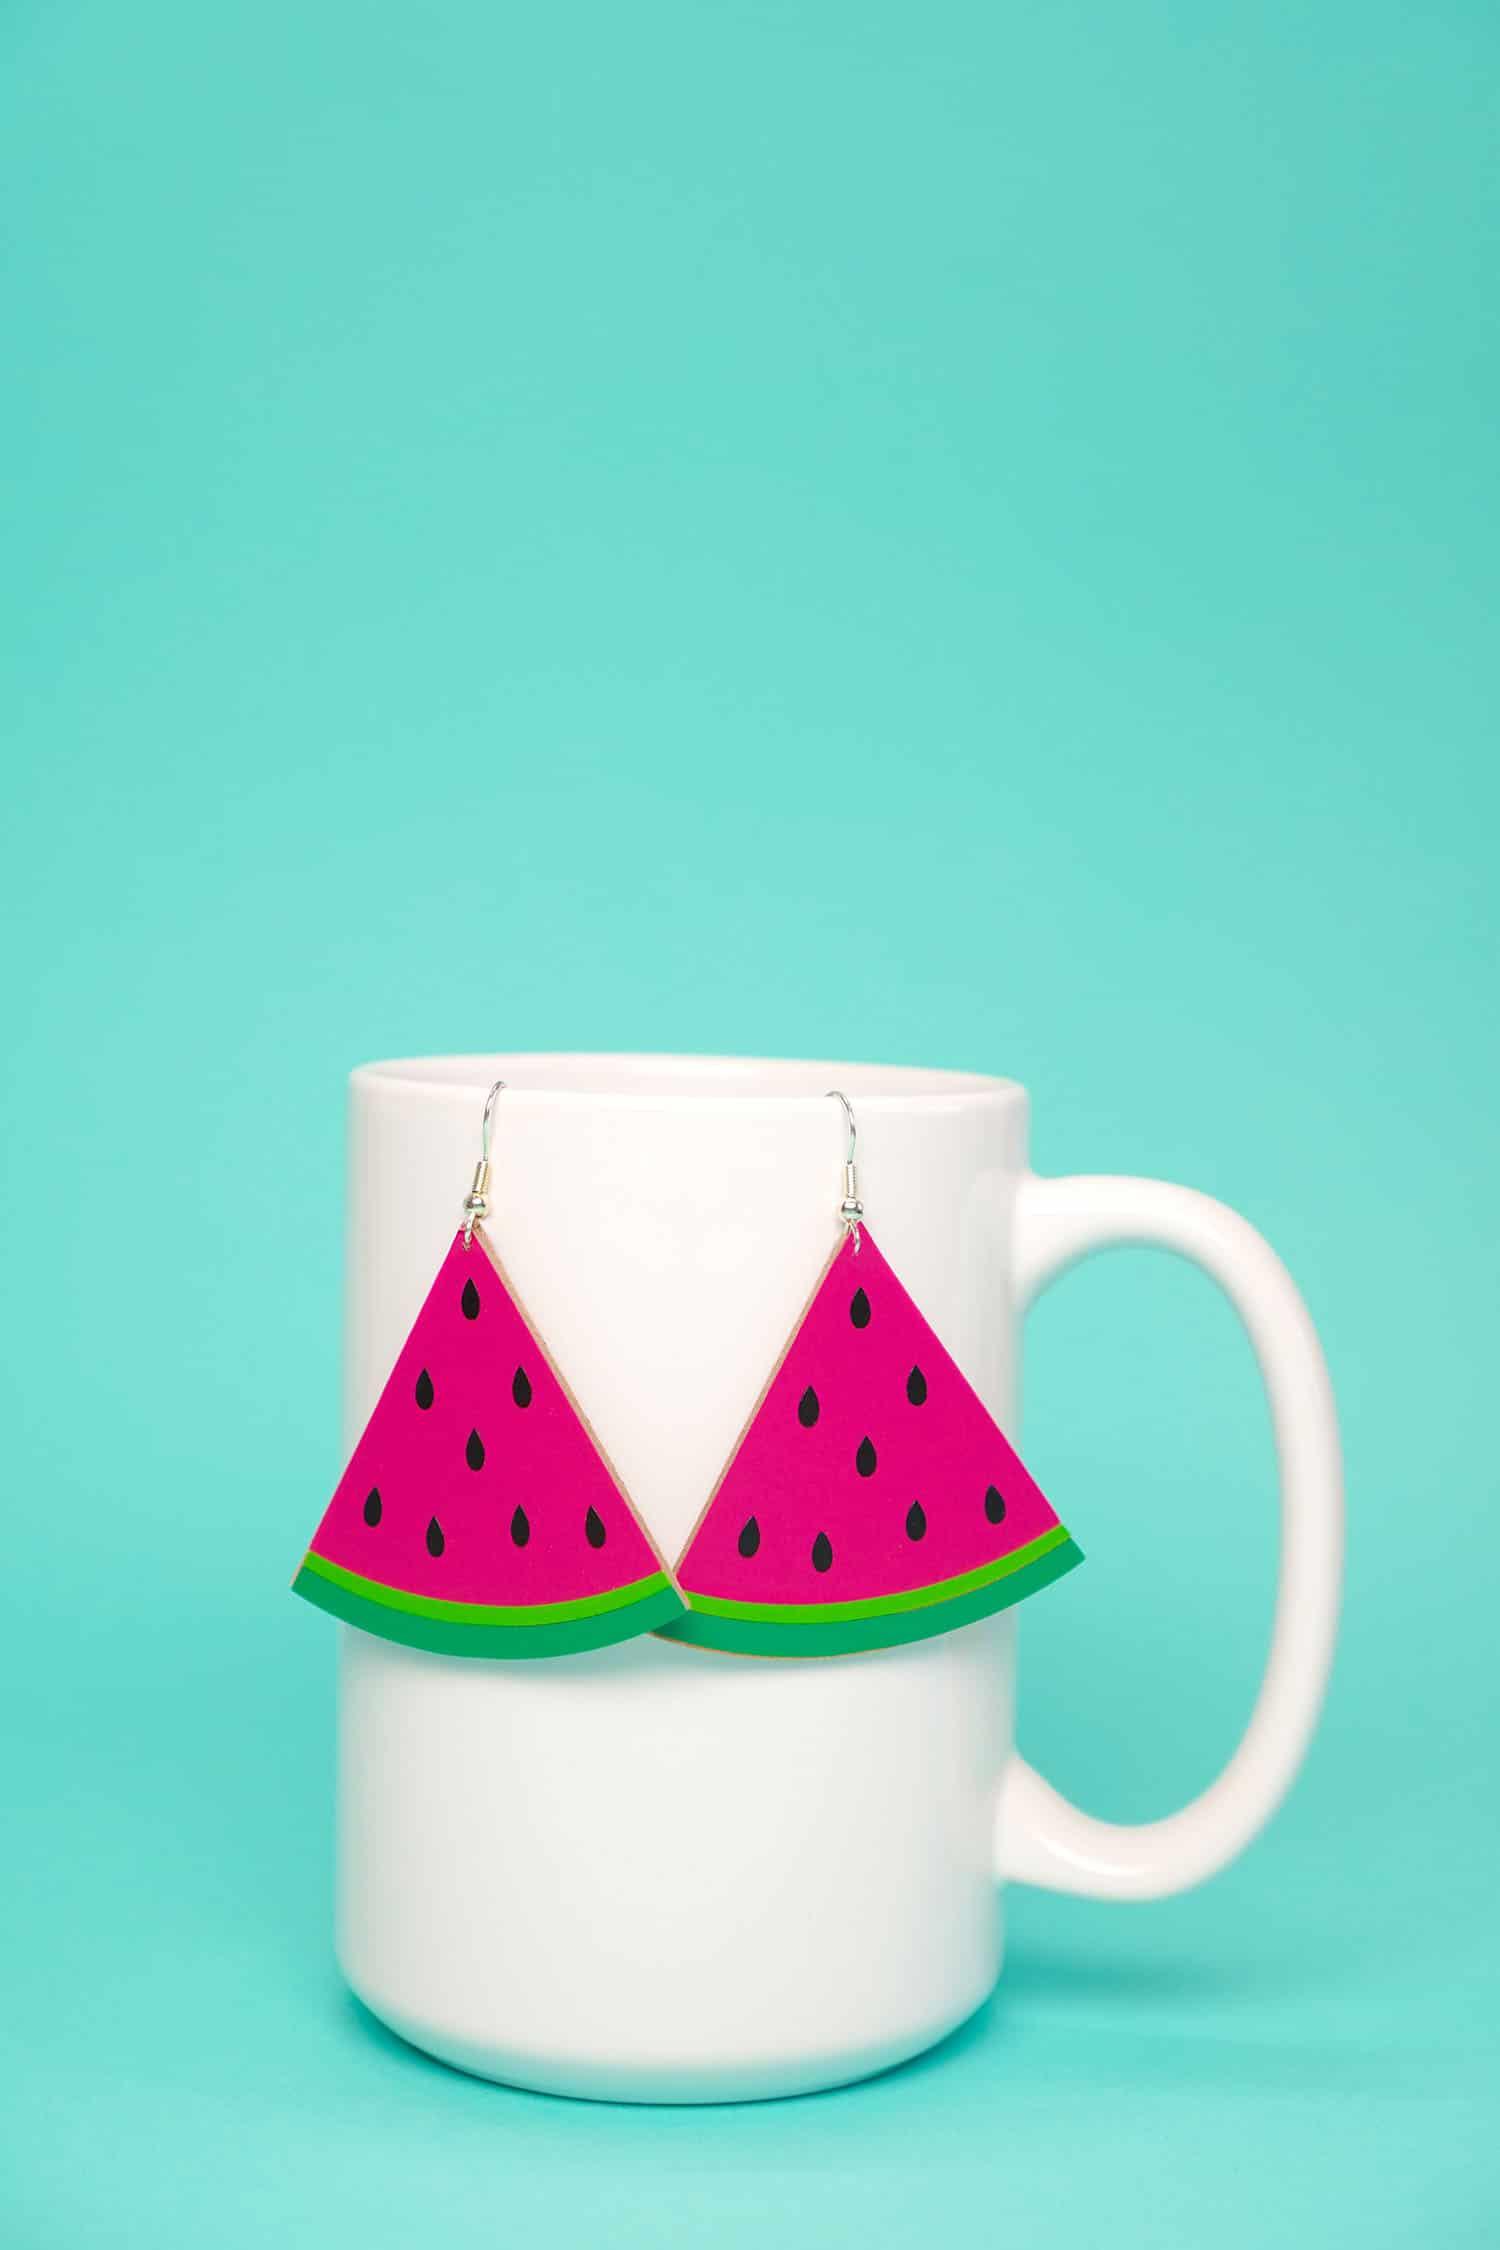 watermelon shaped earrings hanging on a white mug